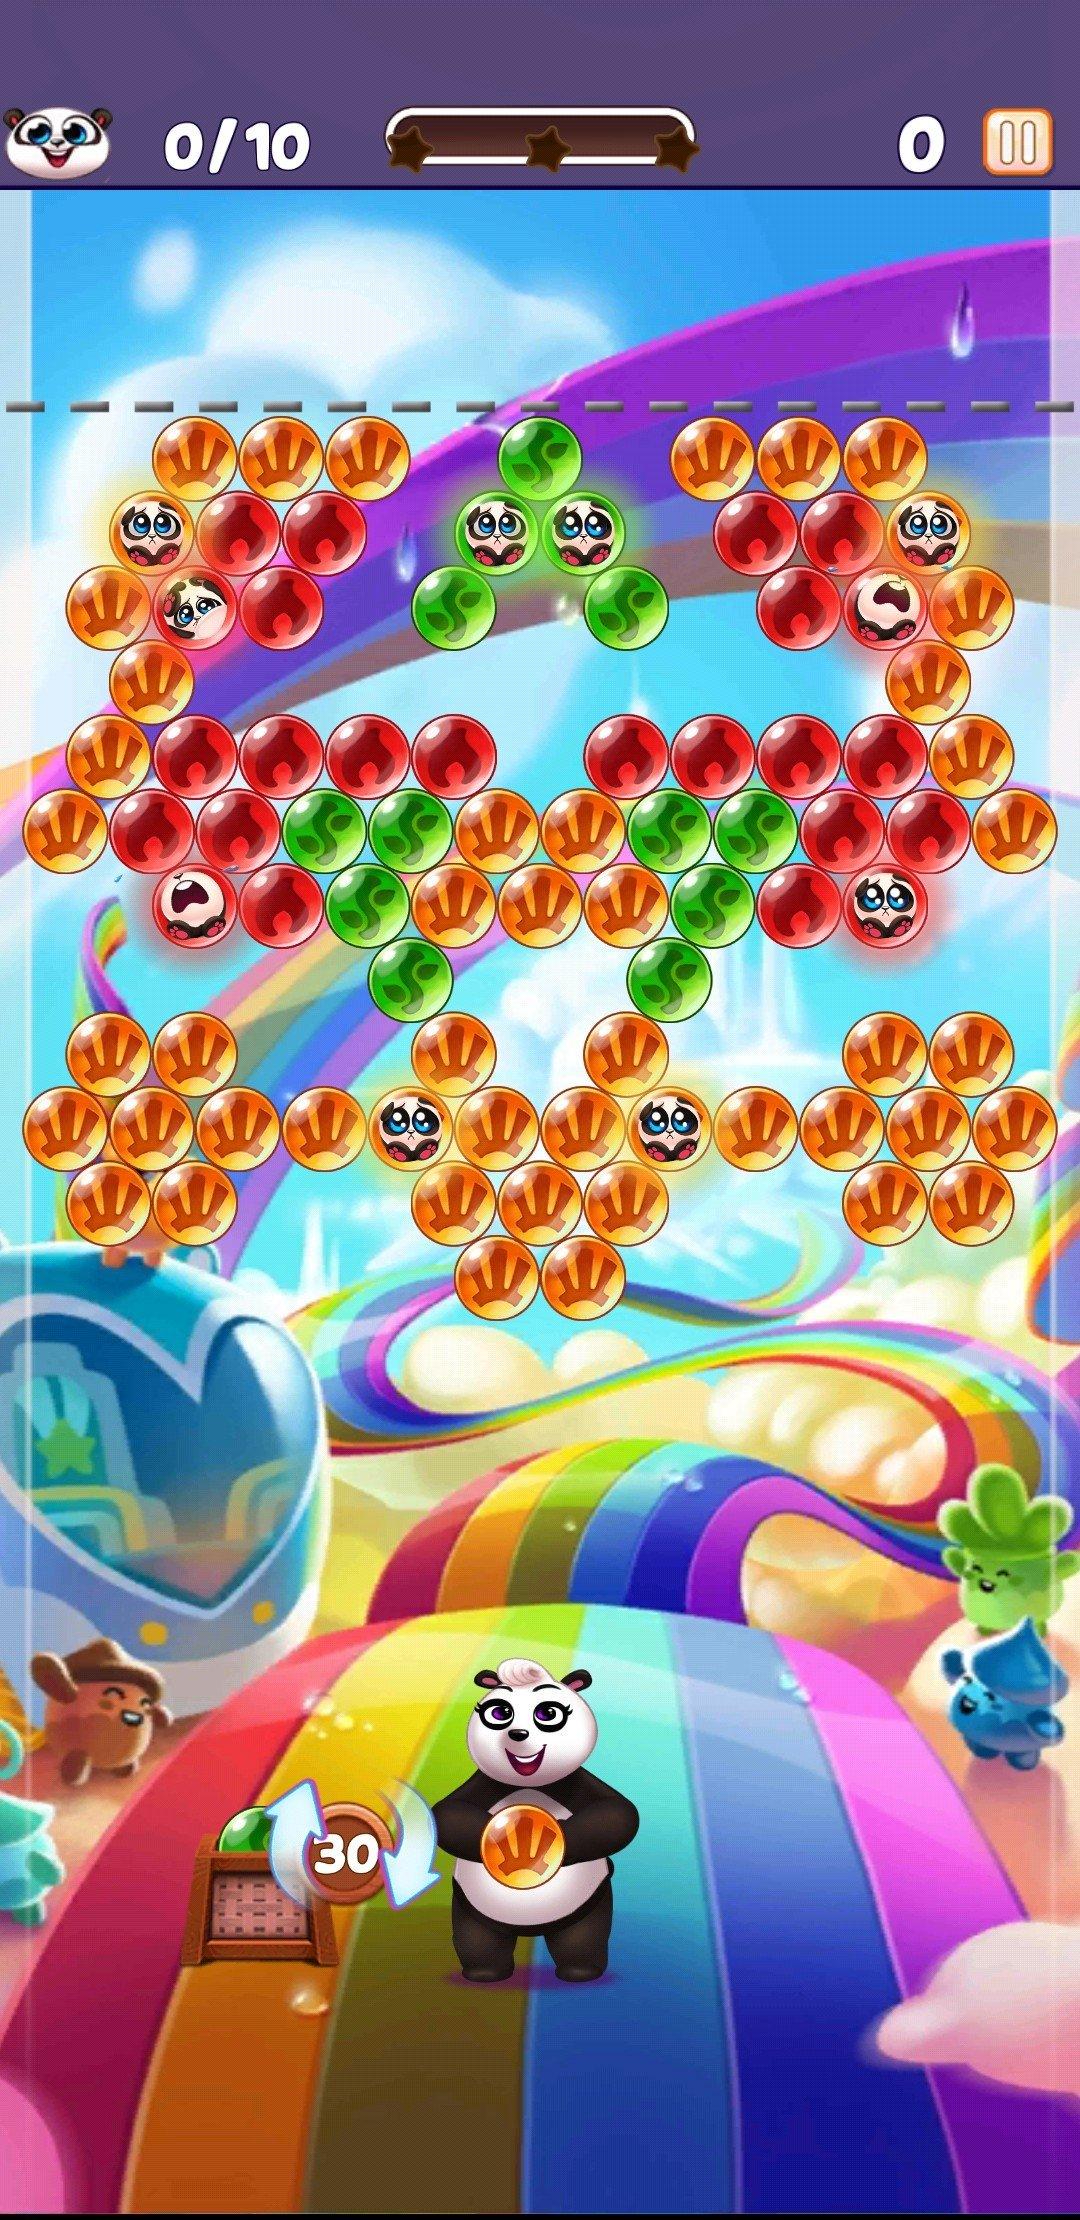 Panda Pop 6 7 011 Descargar Para Android Apk Gratis